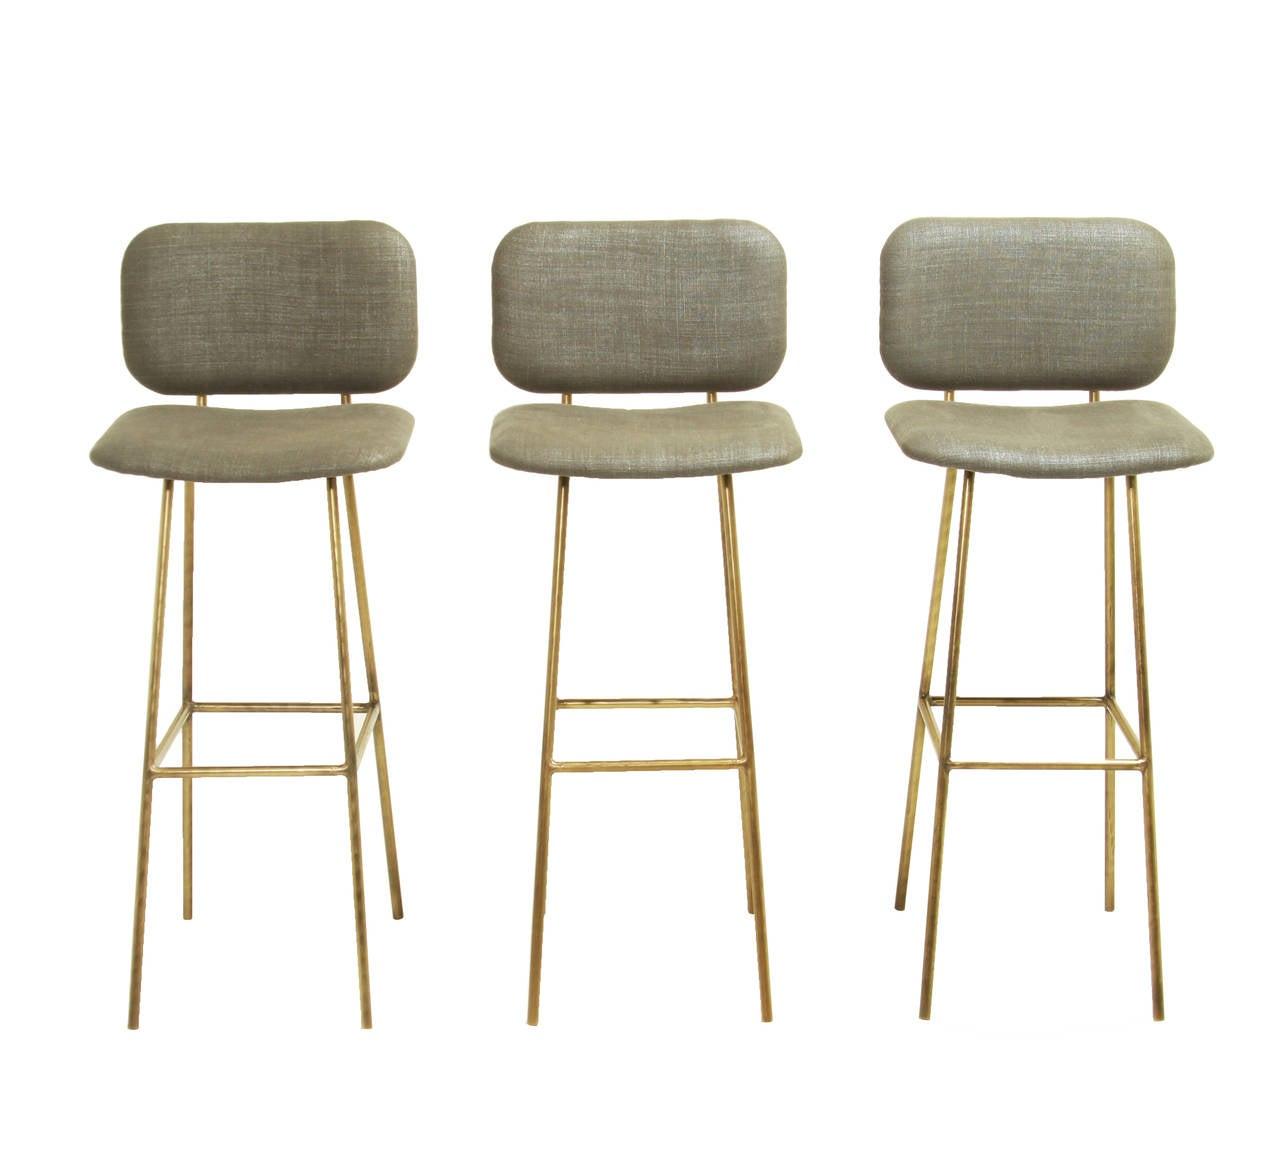 the brass petra bar stool by thomas hayes studio . the brass petra bar stool by thomas hayes studio at stdibs